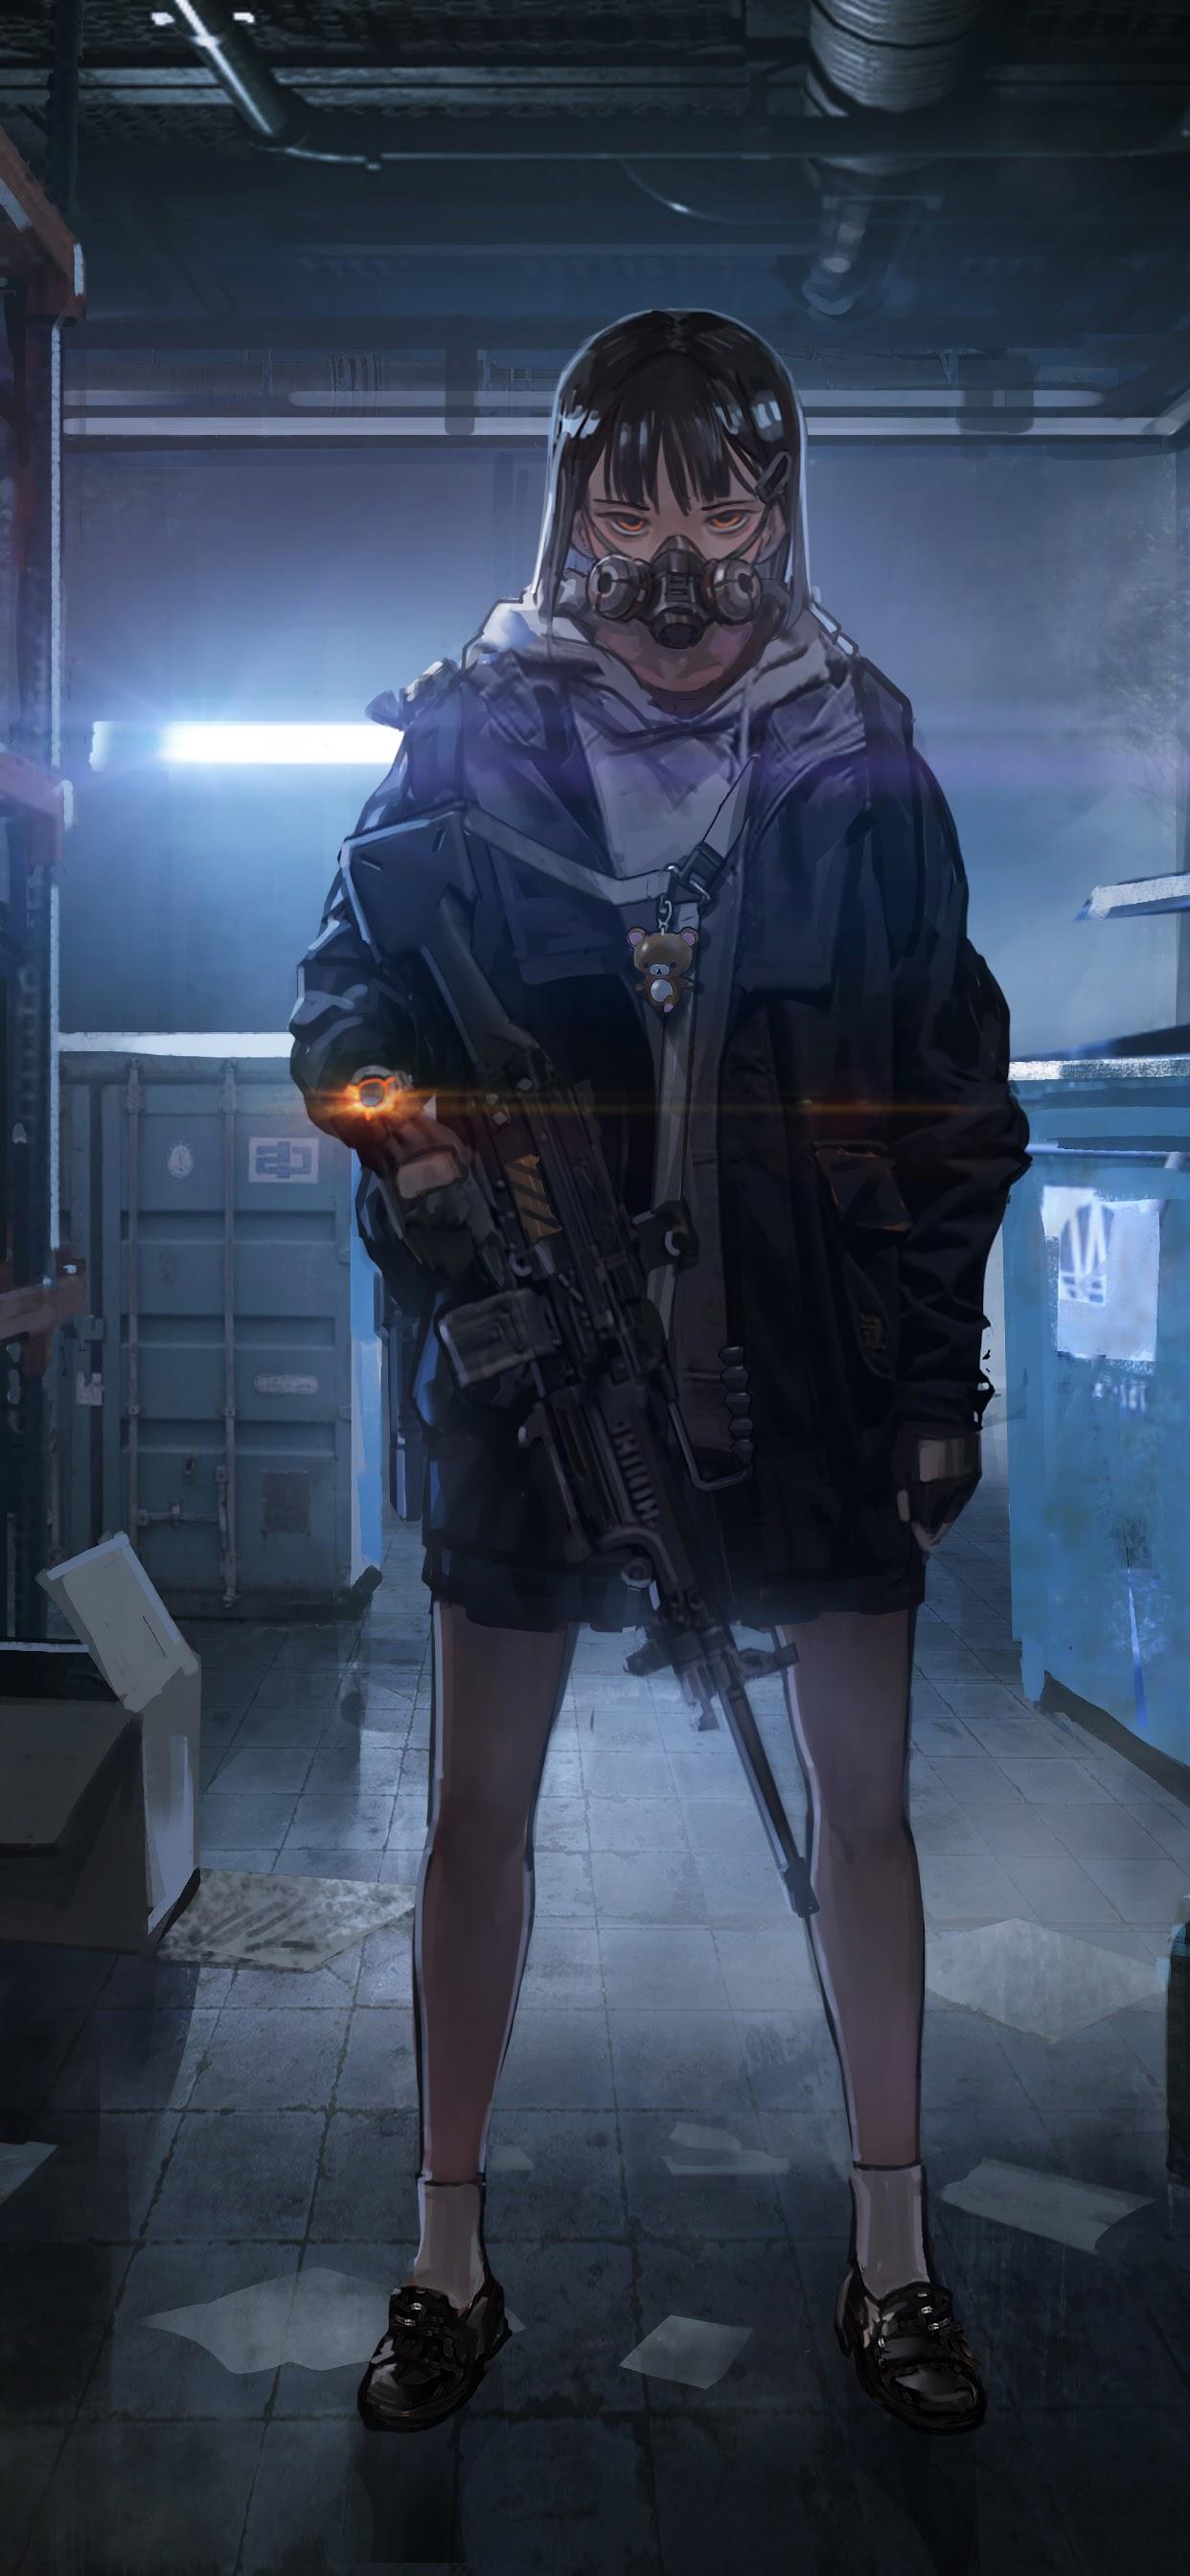 Anime Girl Gas Mask Rifle 8k Wallpaper 178